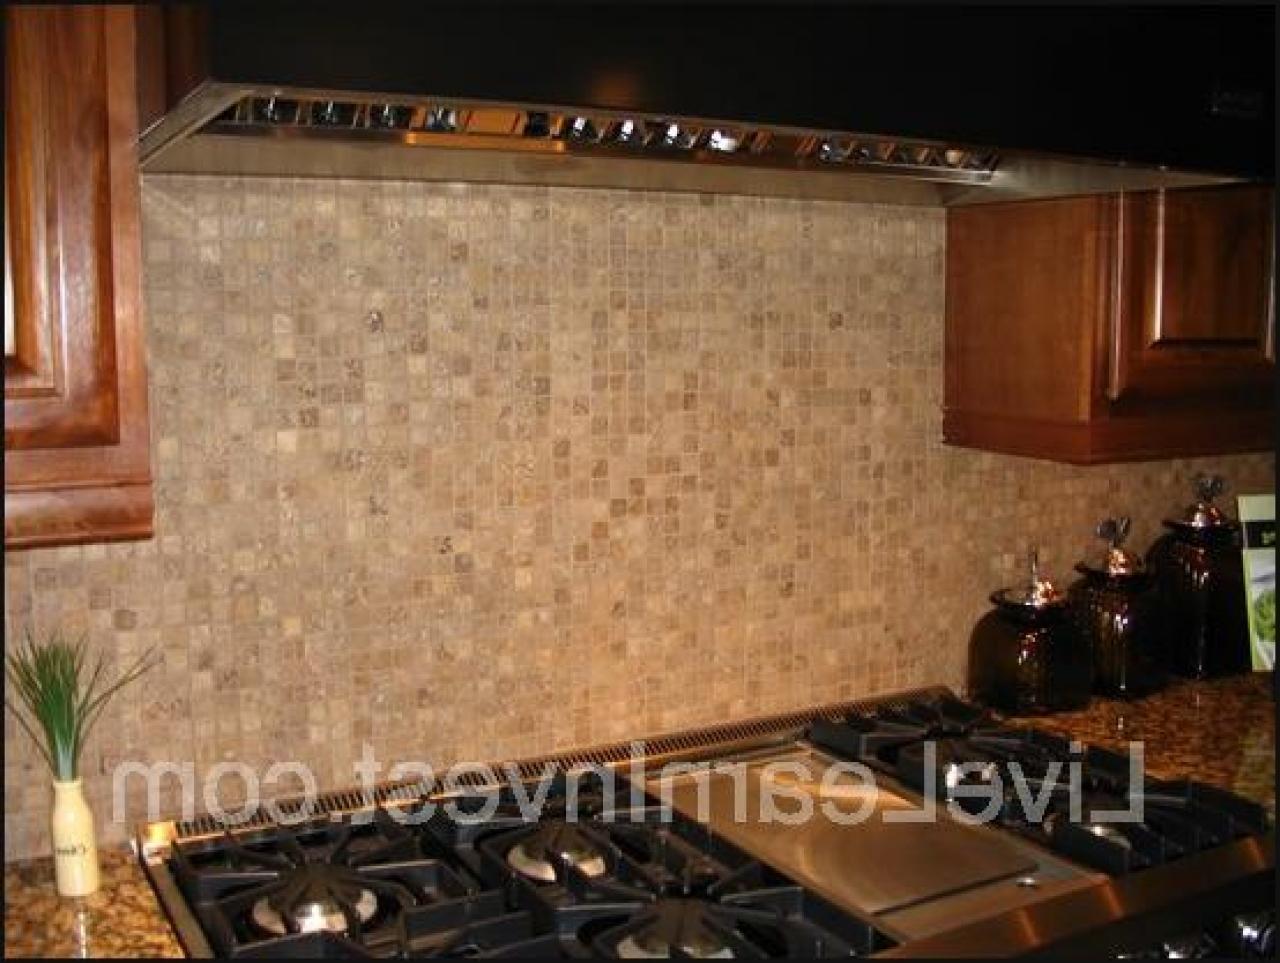 Of kitchen backsplash design ideas backsplash wallpaper in kitchen 1280x963